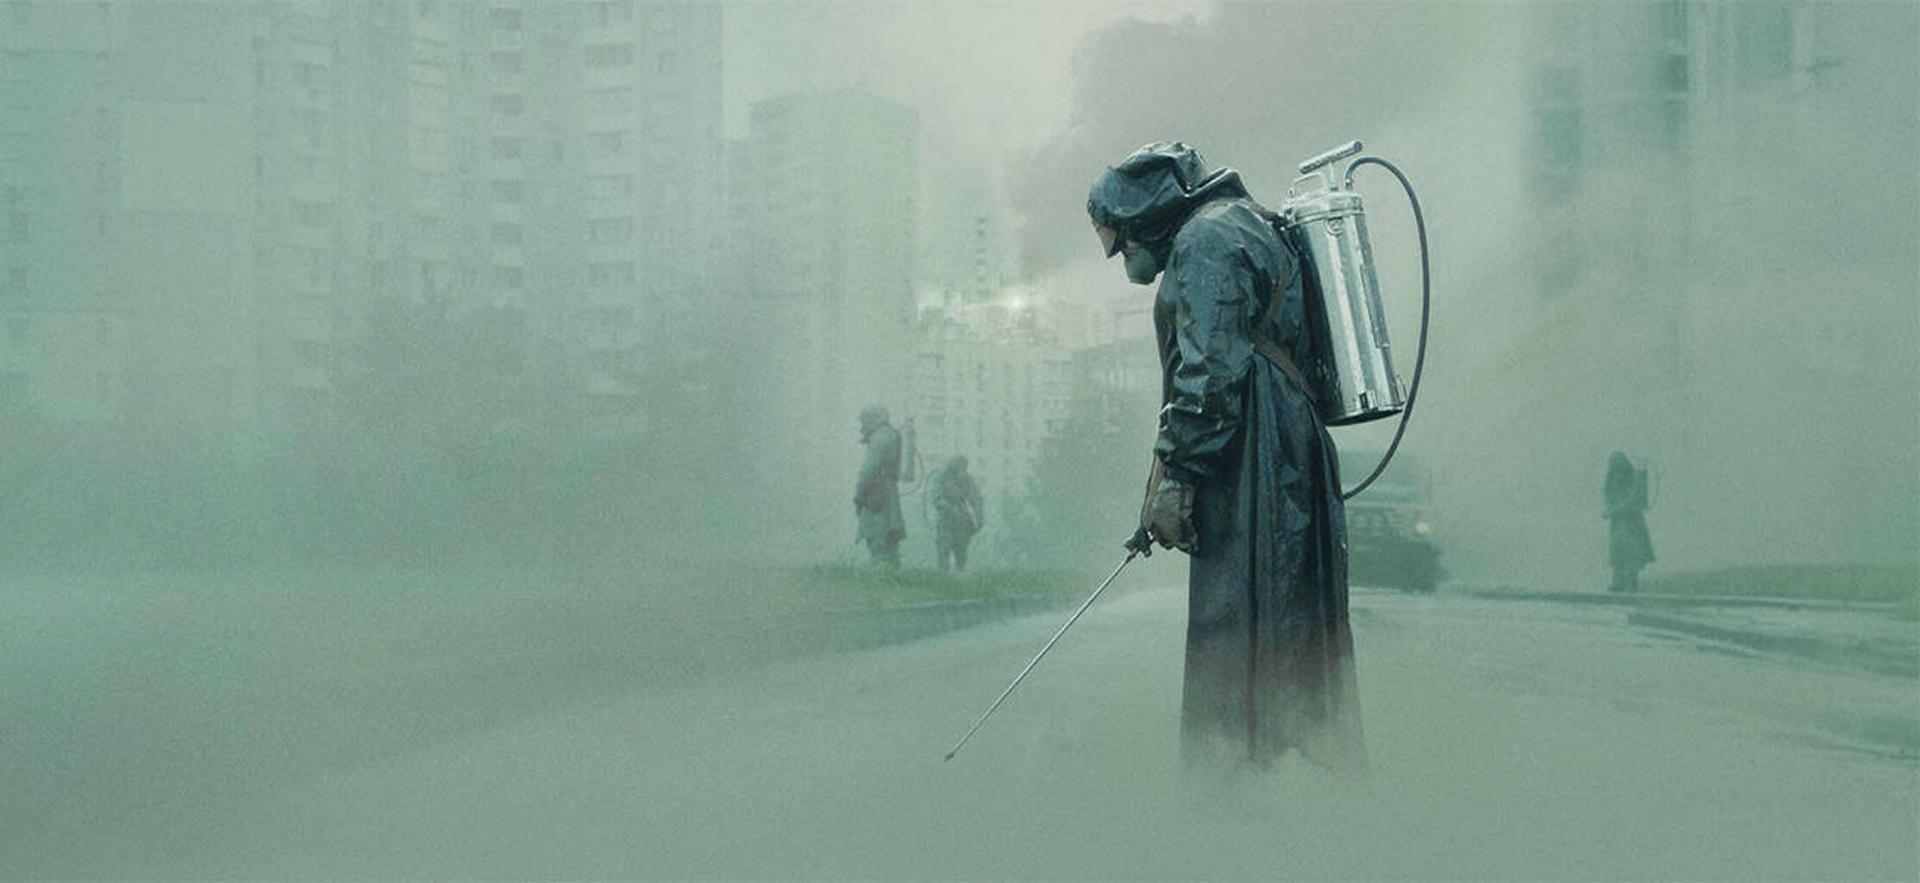 Chernobyl TV Miniseries 215362287 large